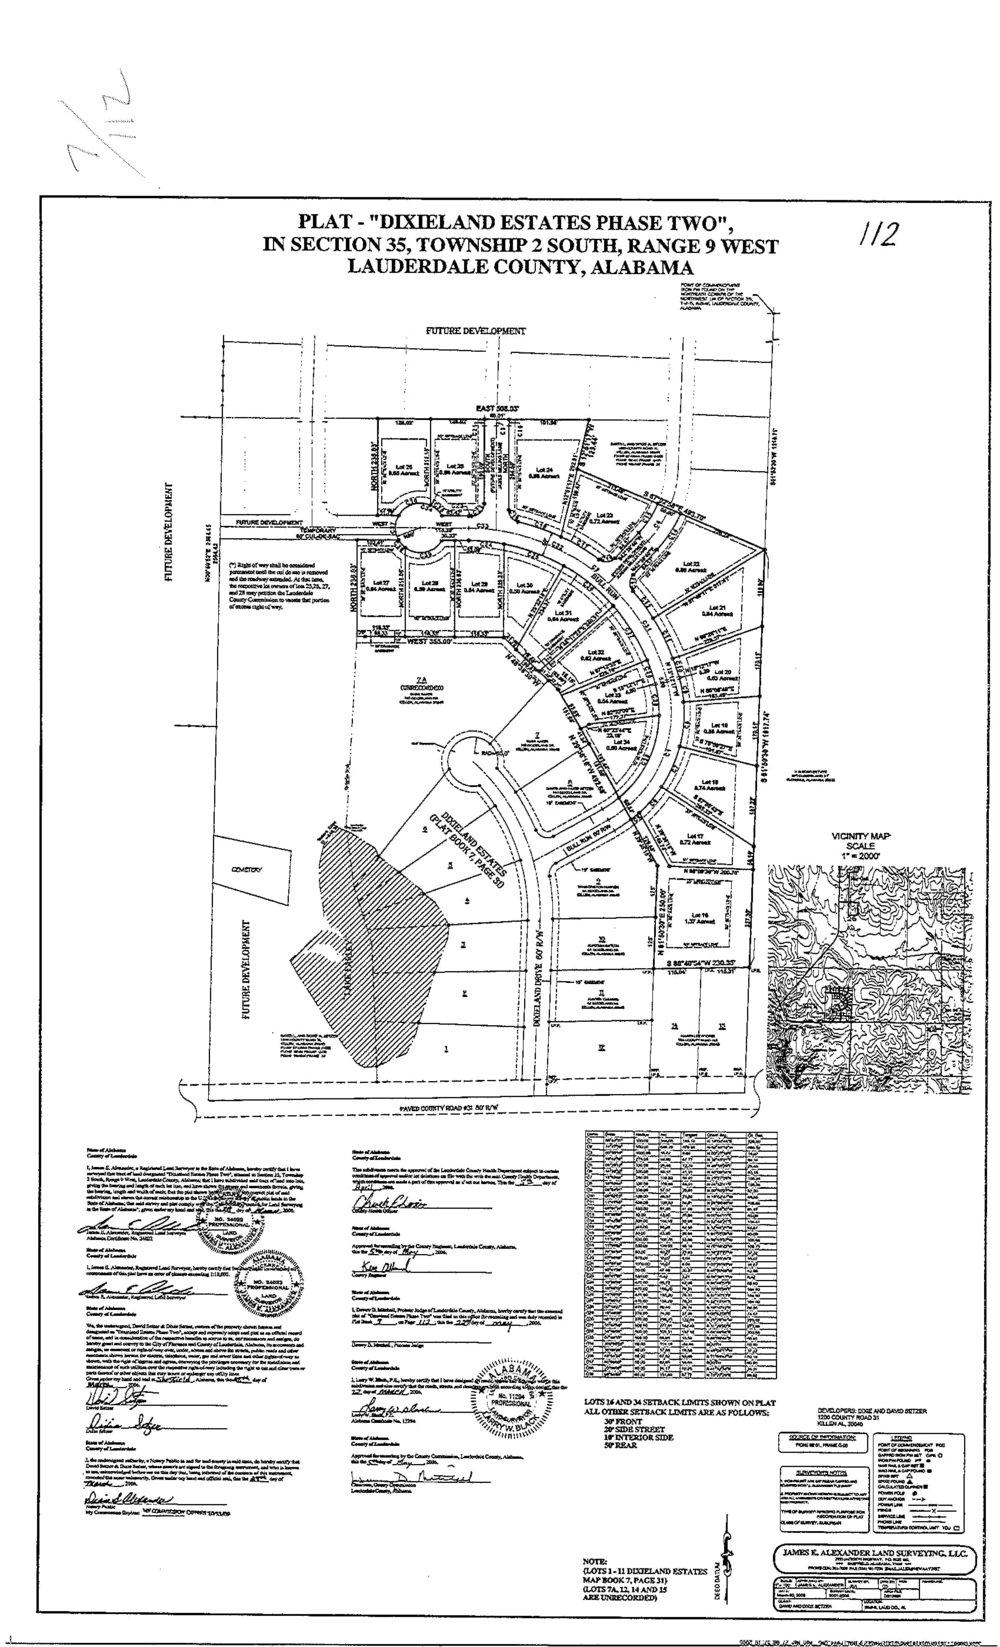 dixieland estates-phase 2- plats-1.jpg